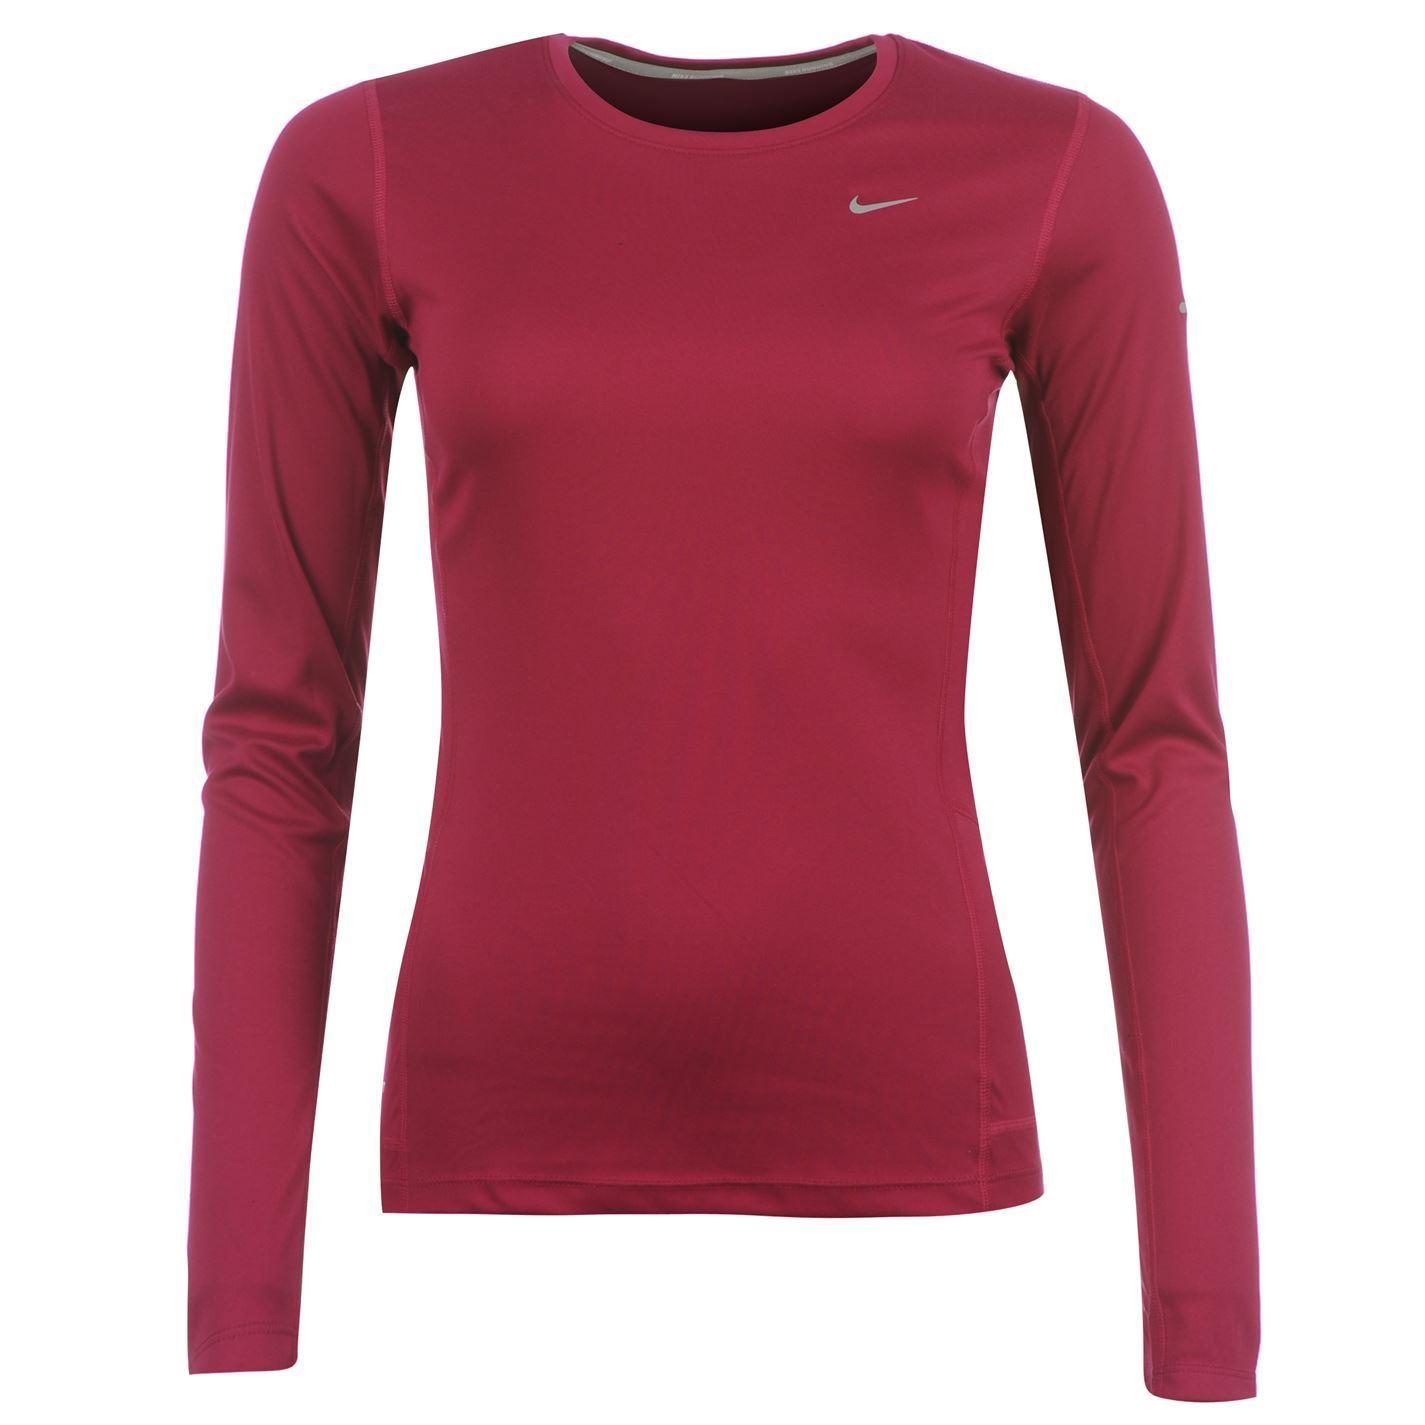 Nike womens miler t shirt ladies long sleeve running for Long sleeve running shirt womens